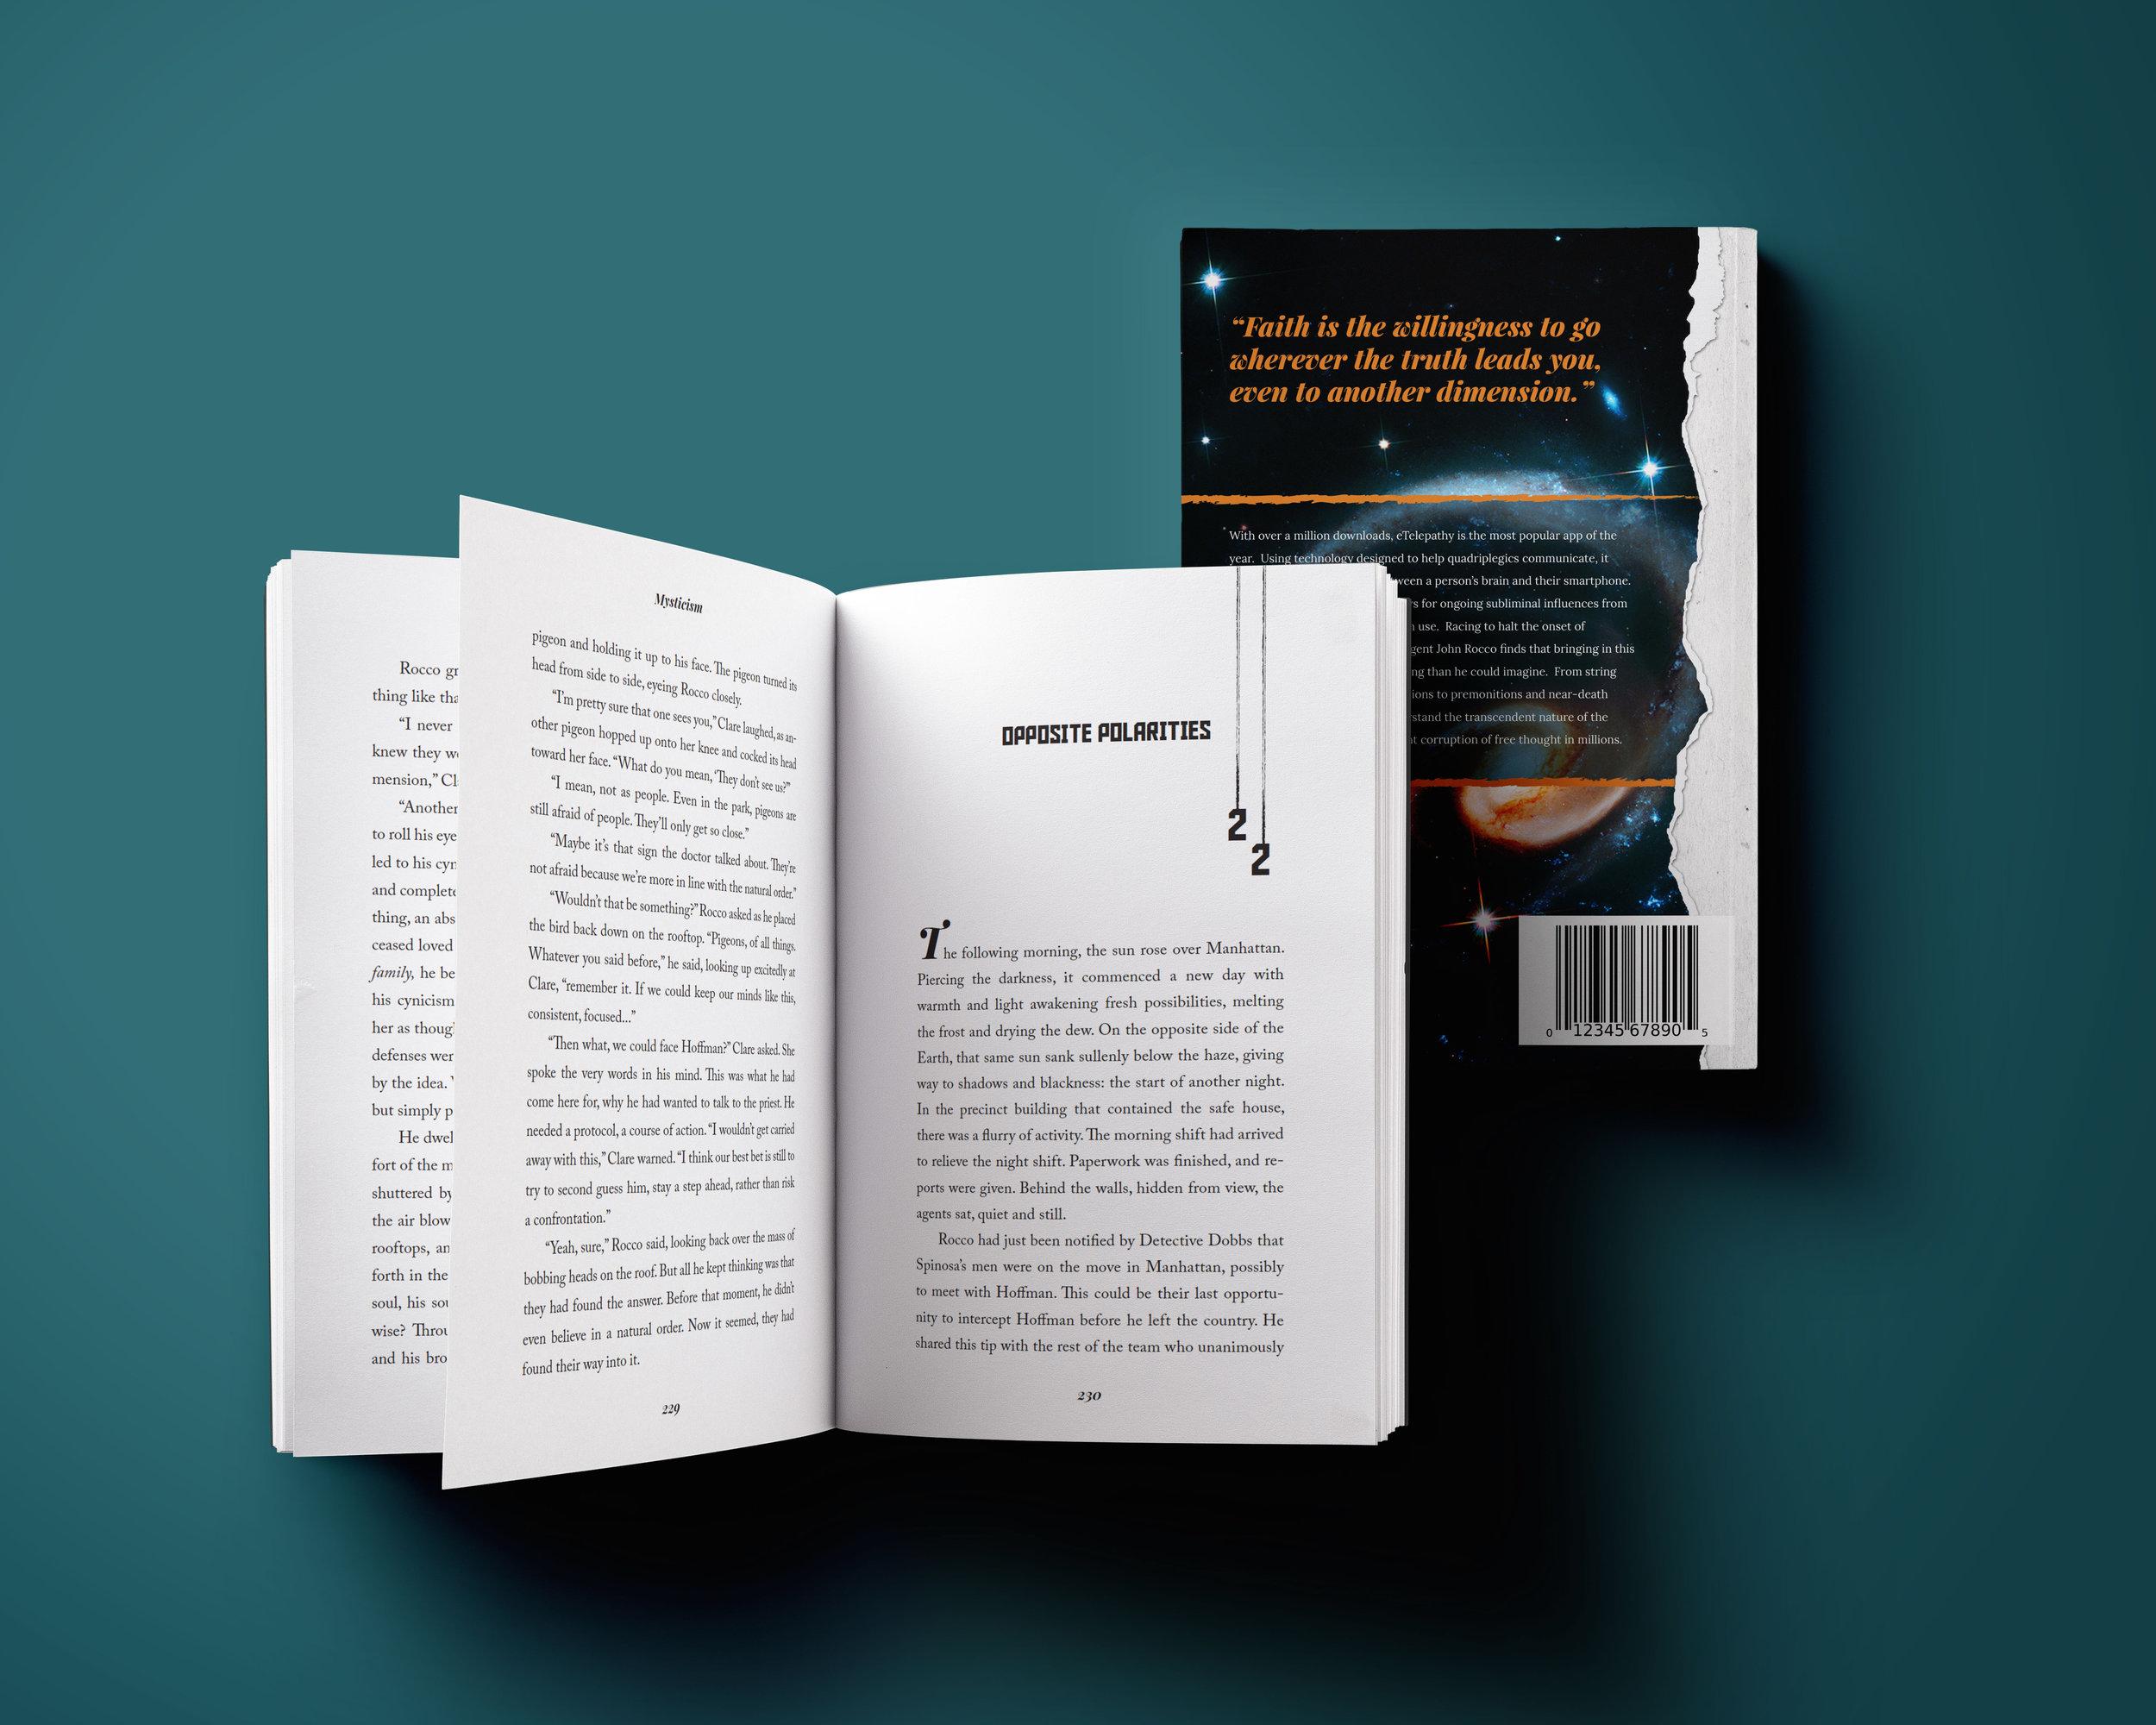 Paperback-Book-Mockup-vol-2 cropped.jpg